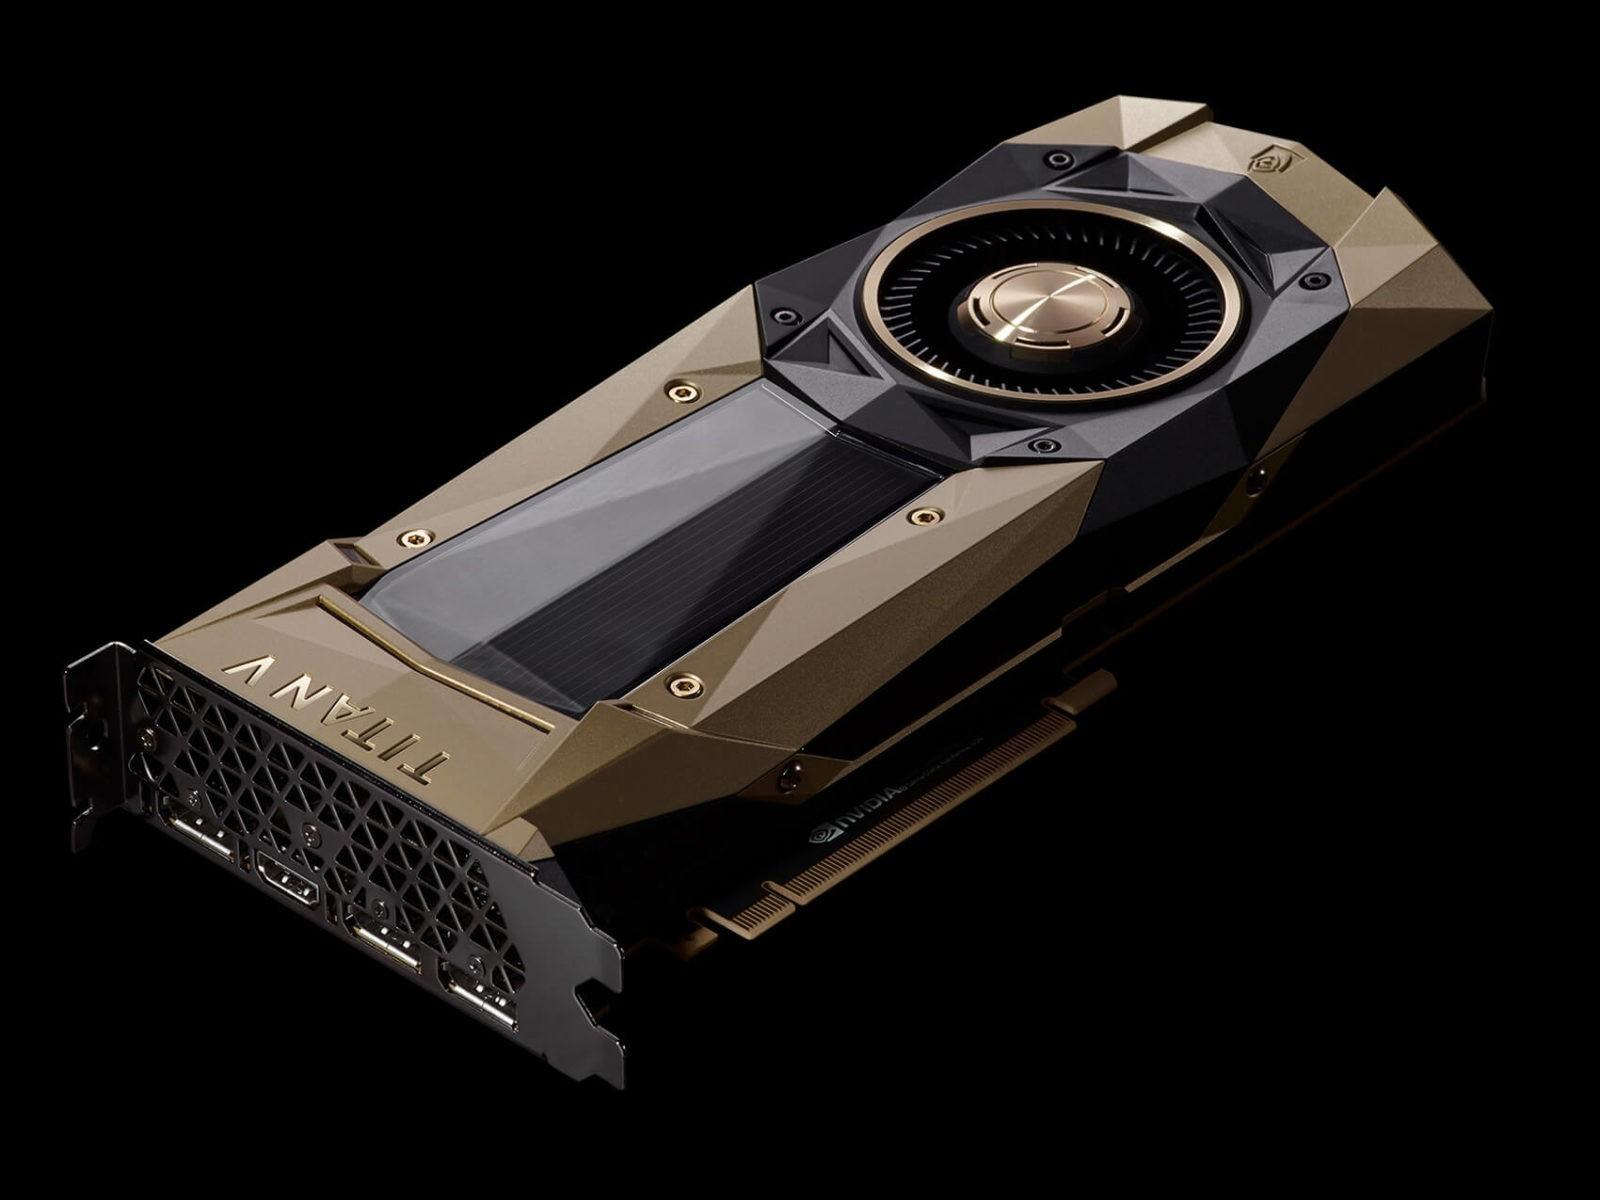 Видеокарта серии NVIDIA GTX TITAN V для майнинга